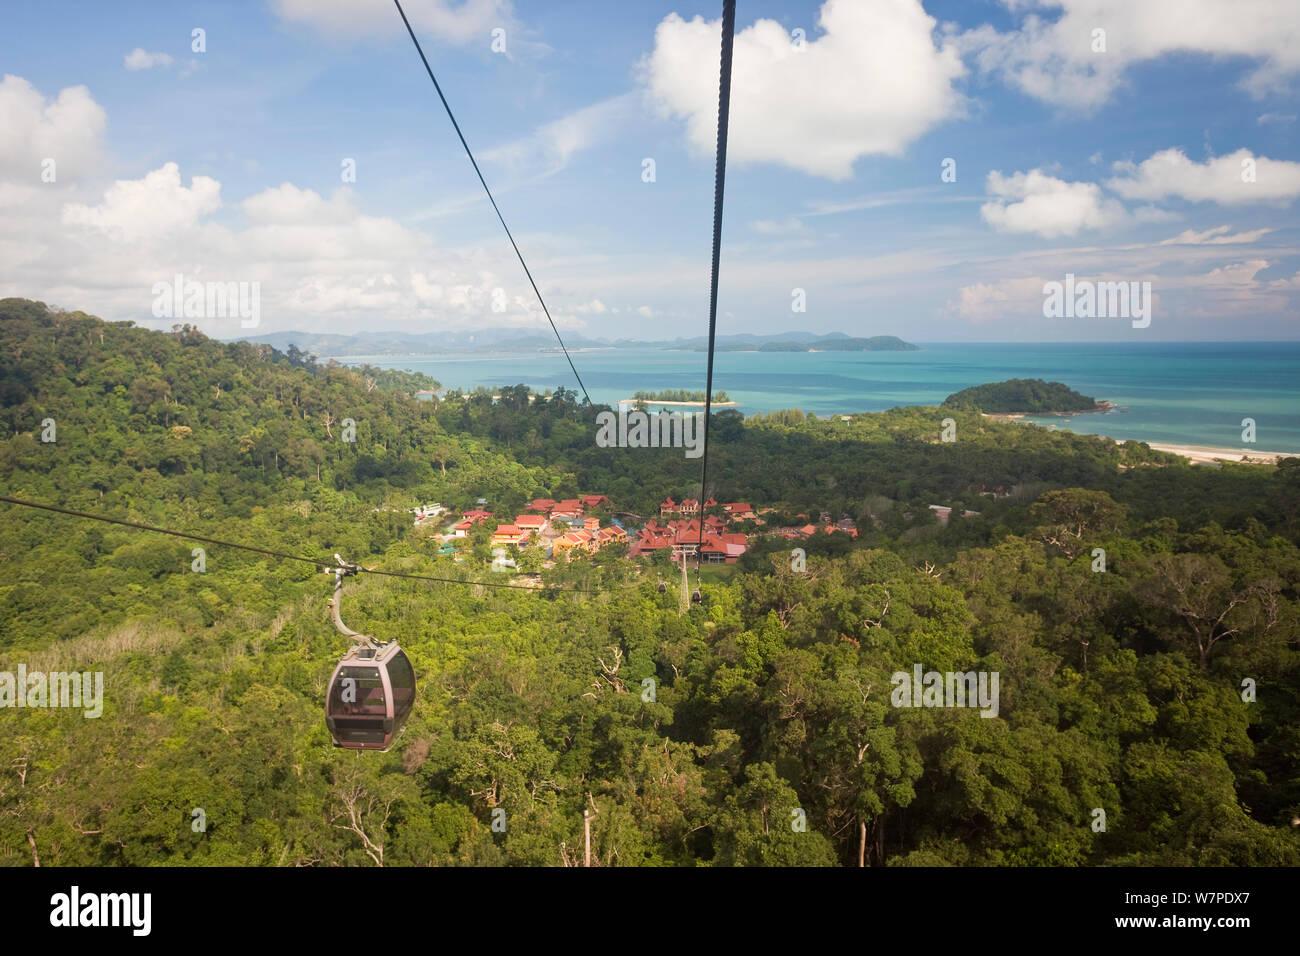 Langkawi cable car to the top of Mount Gunung Machinchang (708m), with views of Langkawi and the Andaman Sea, Pulau Langkawi, Langkawi Island, Malaysia 2008 Stock Photo